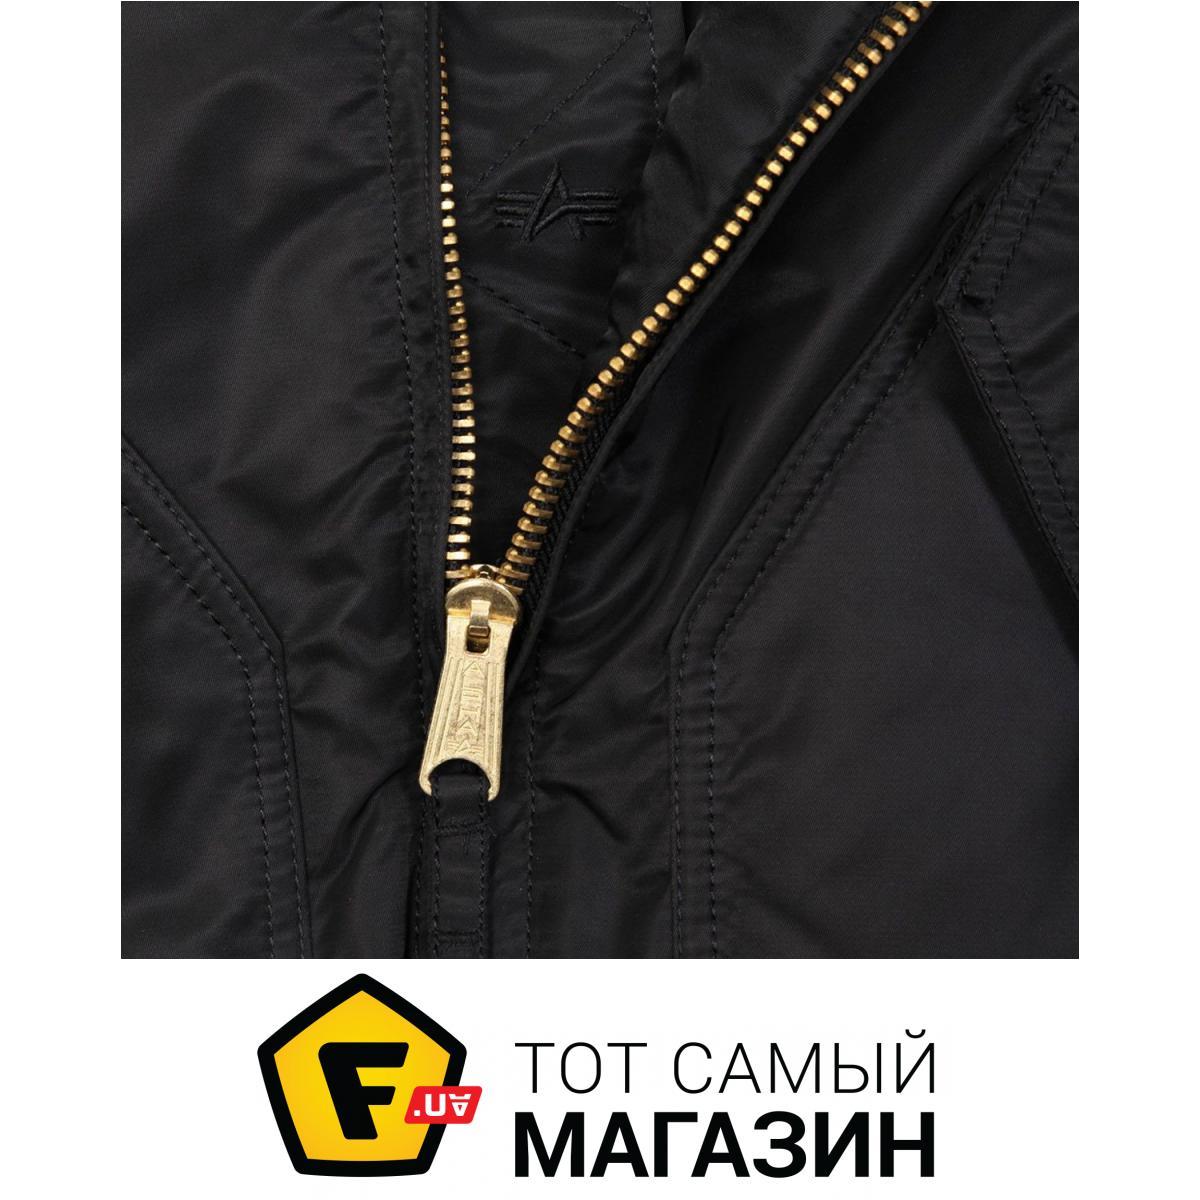 d5a7607a Alpha Industries CWU 45/P Slim Fit Flight Jacket XL, Black (MJC47501C1)